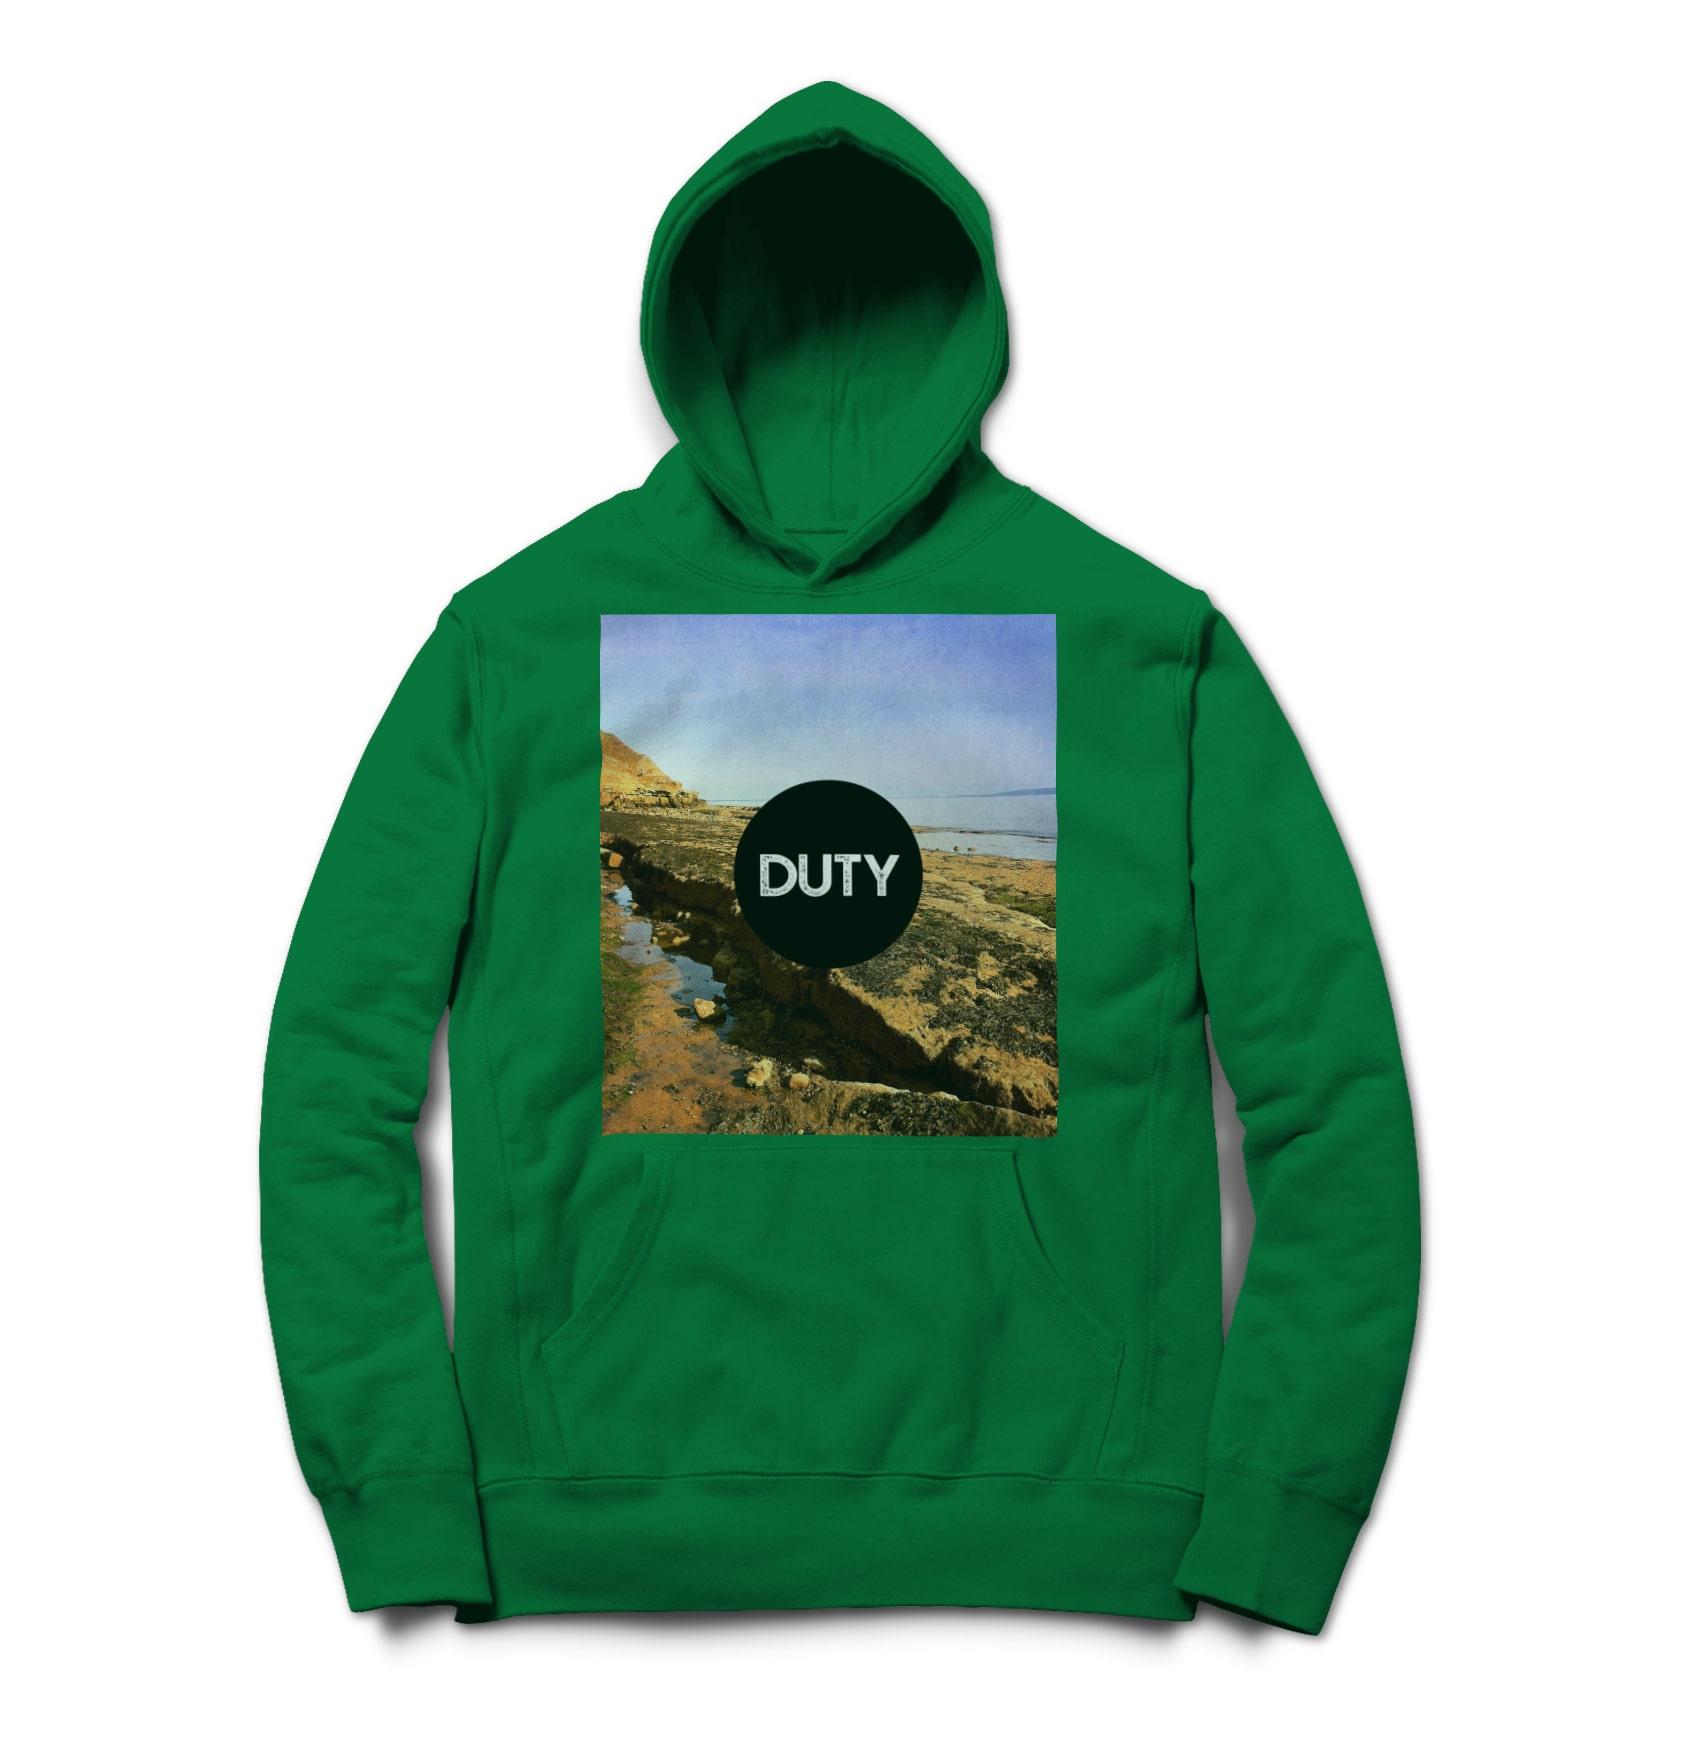 Duty emanate 1541536331